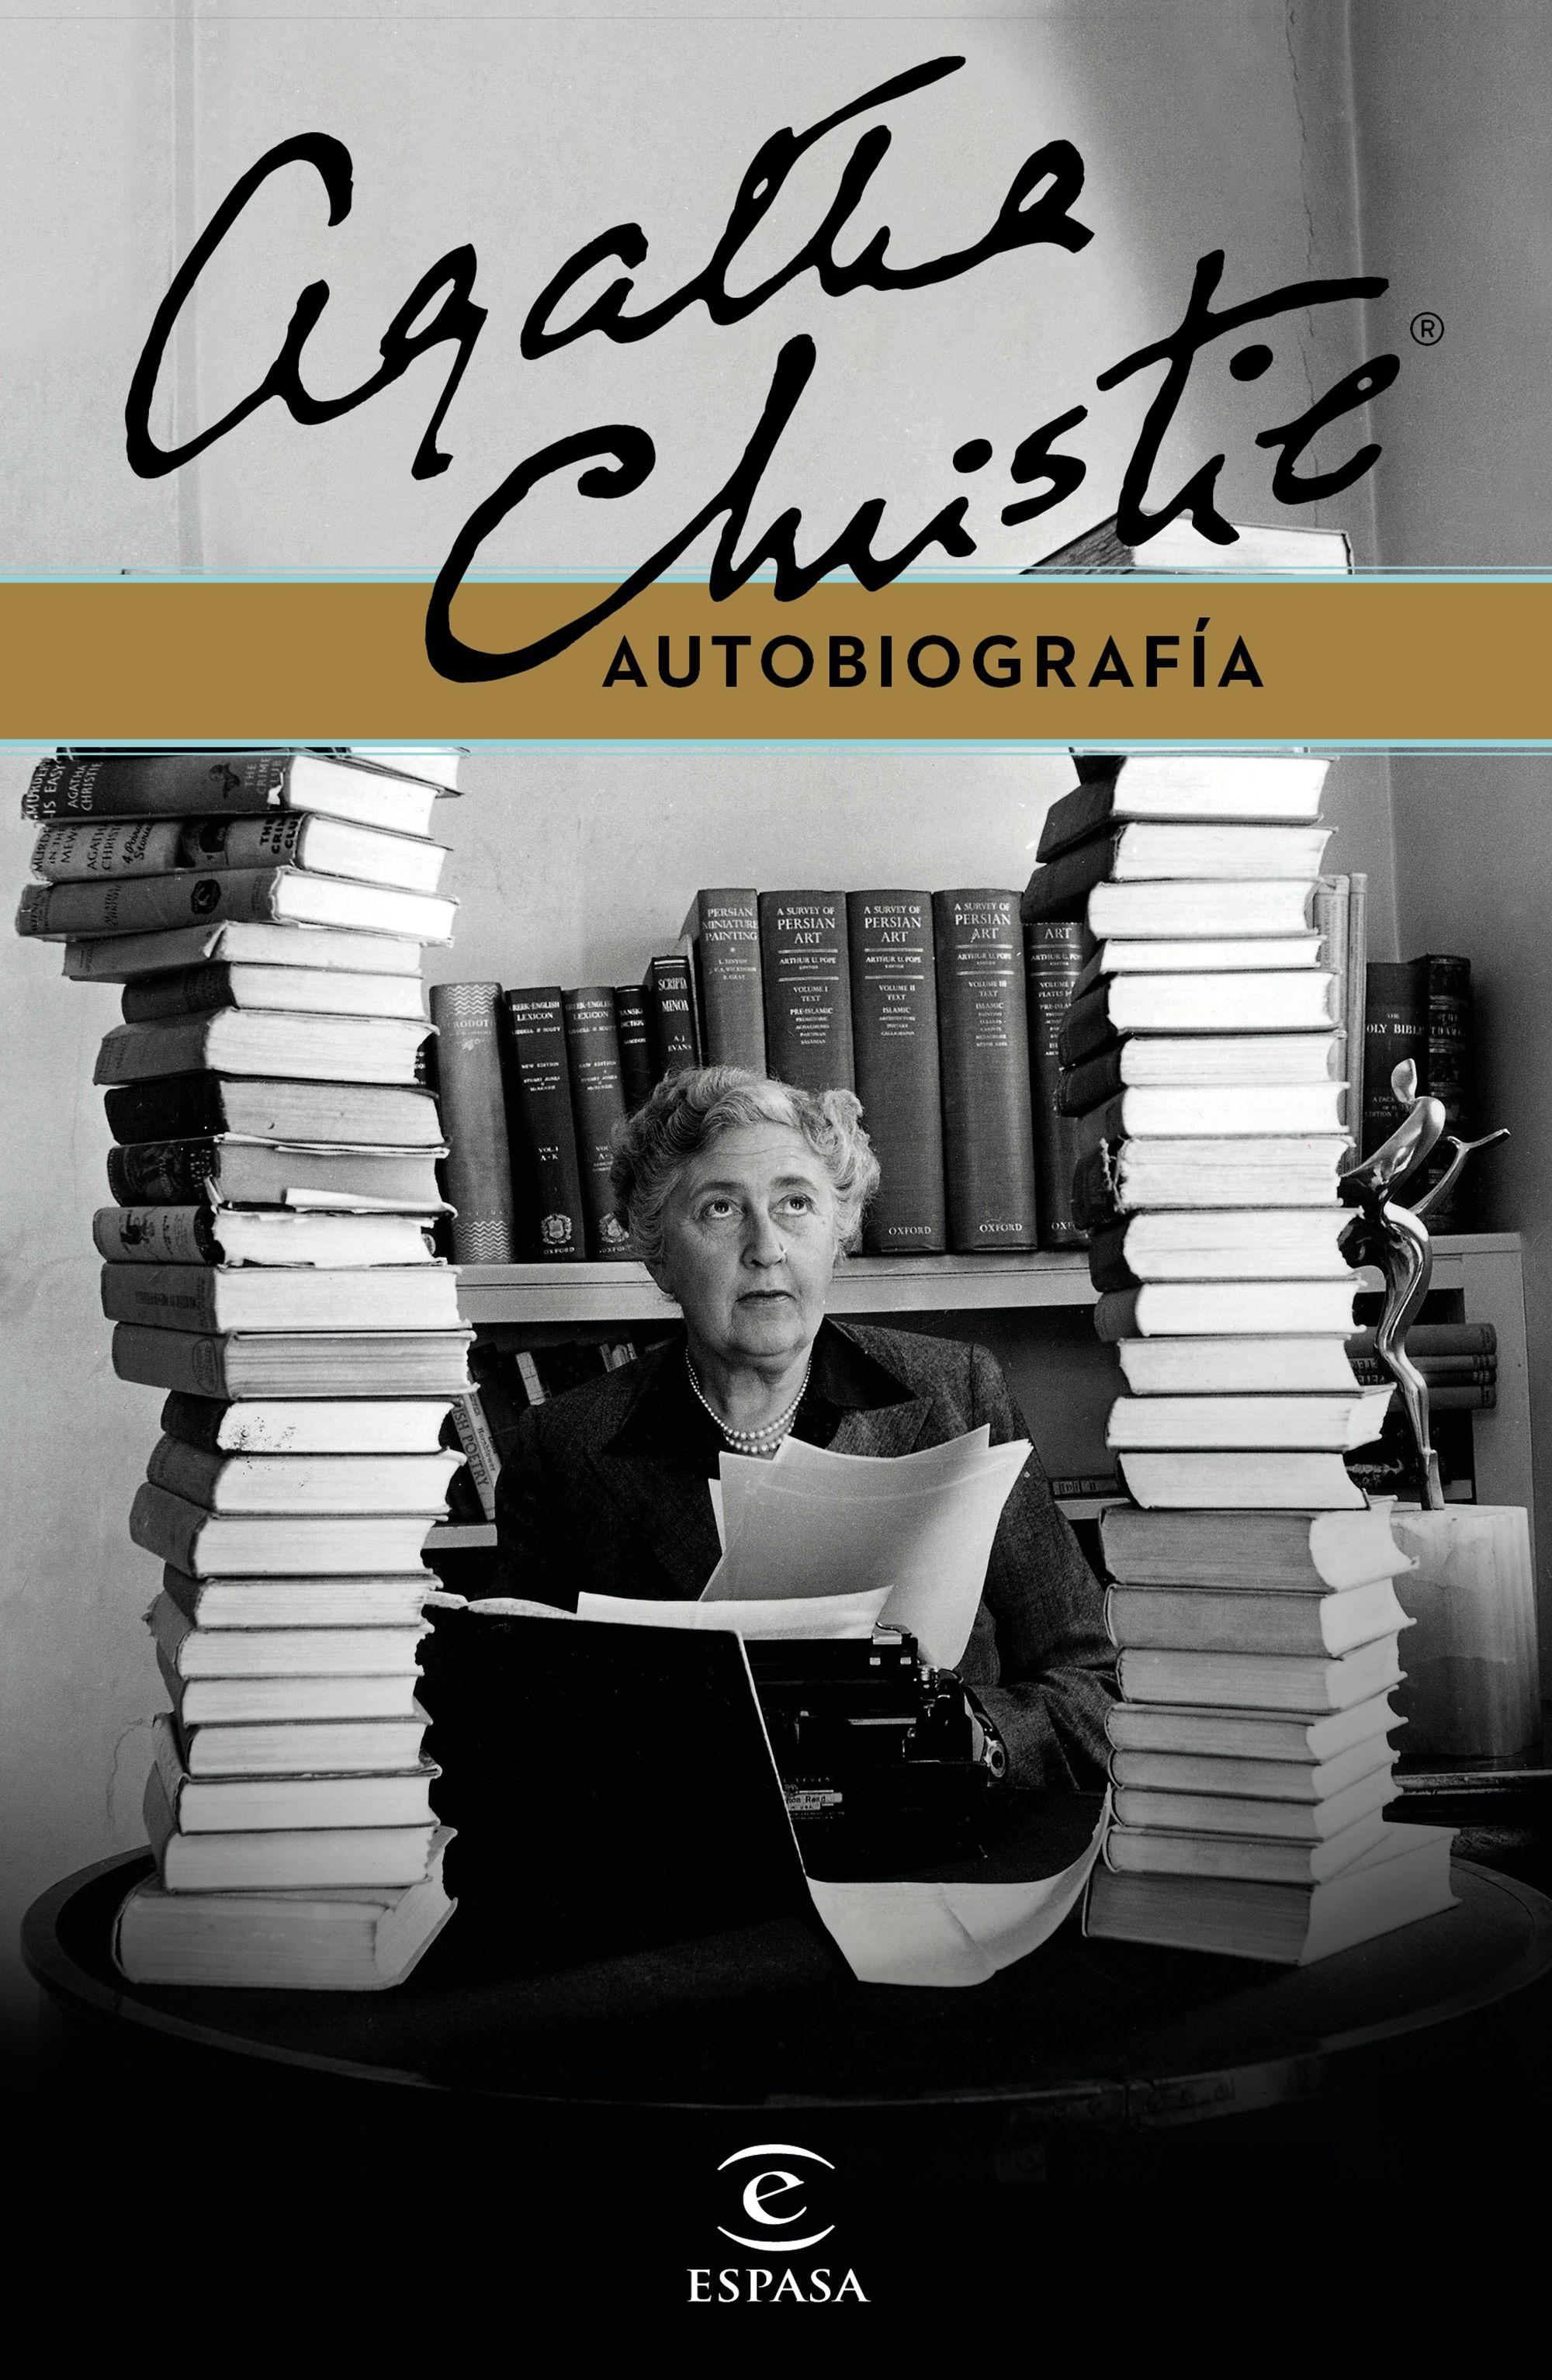 El universo de la lectura - Página 13 Portada_autobiografia_agatha-christie_201907021507